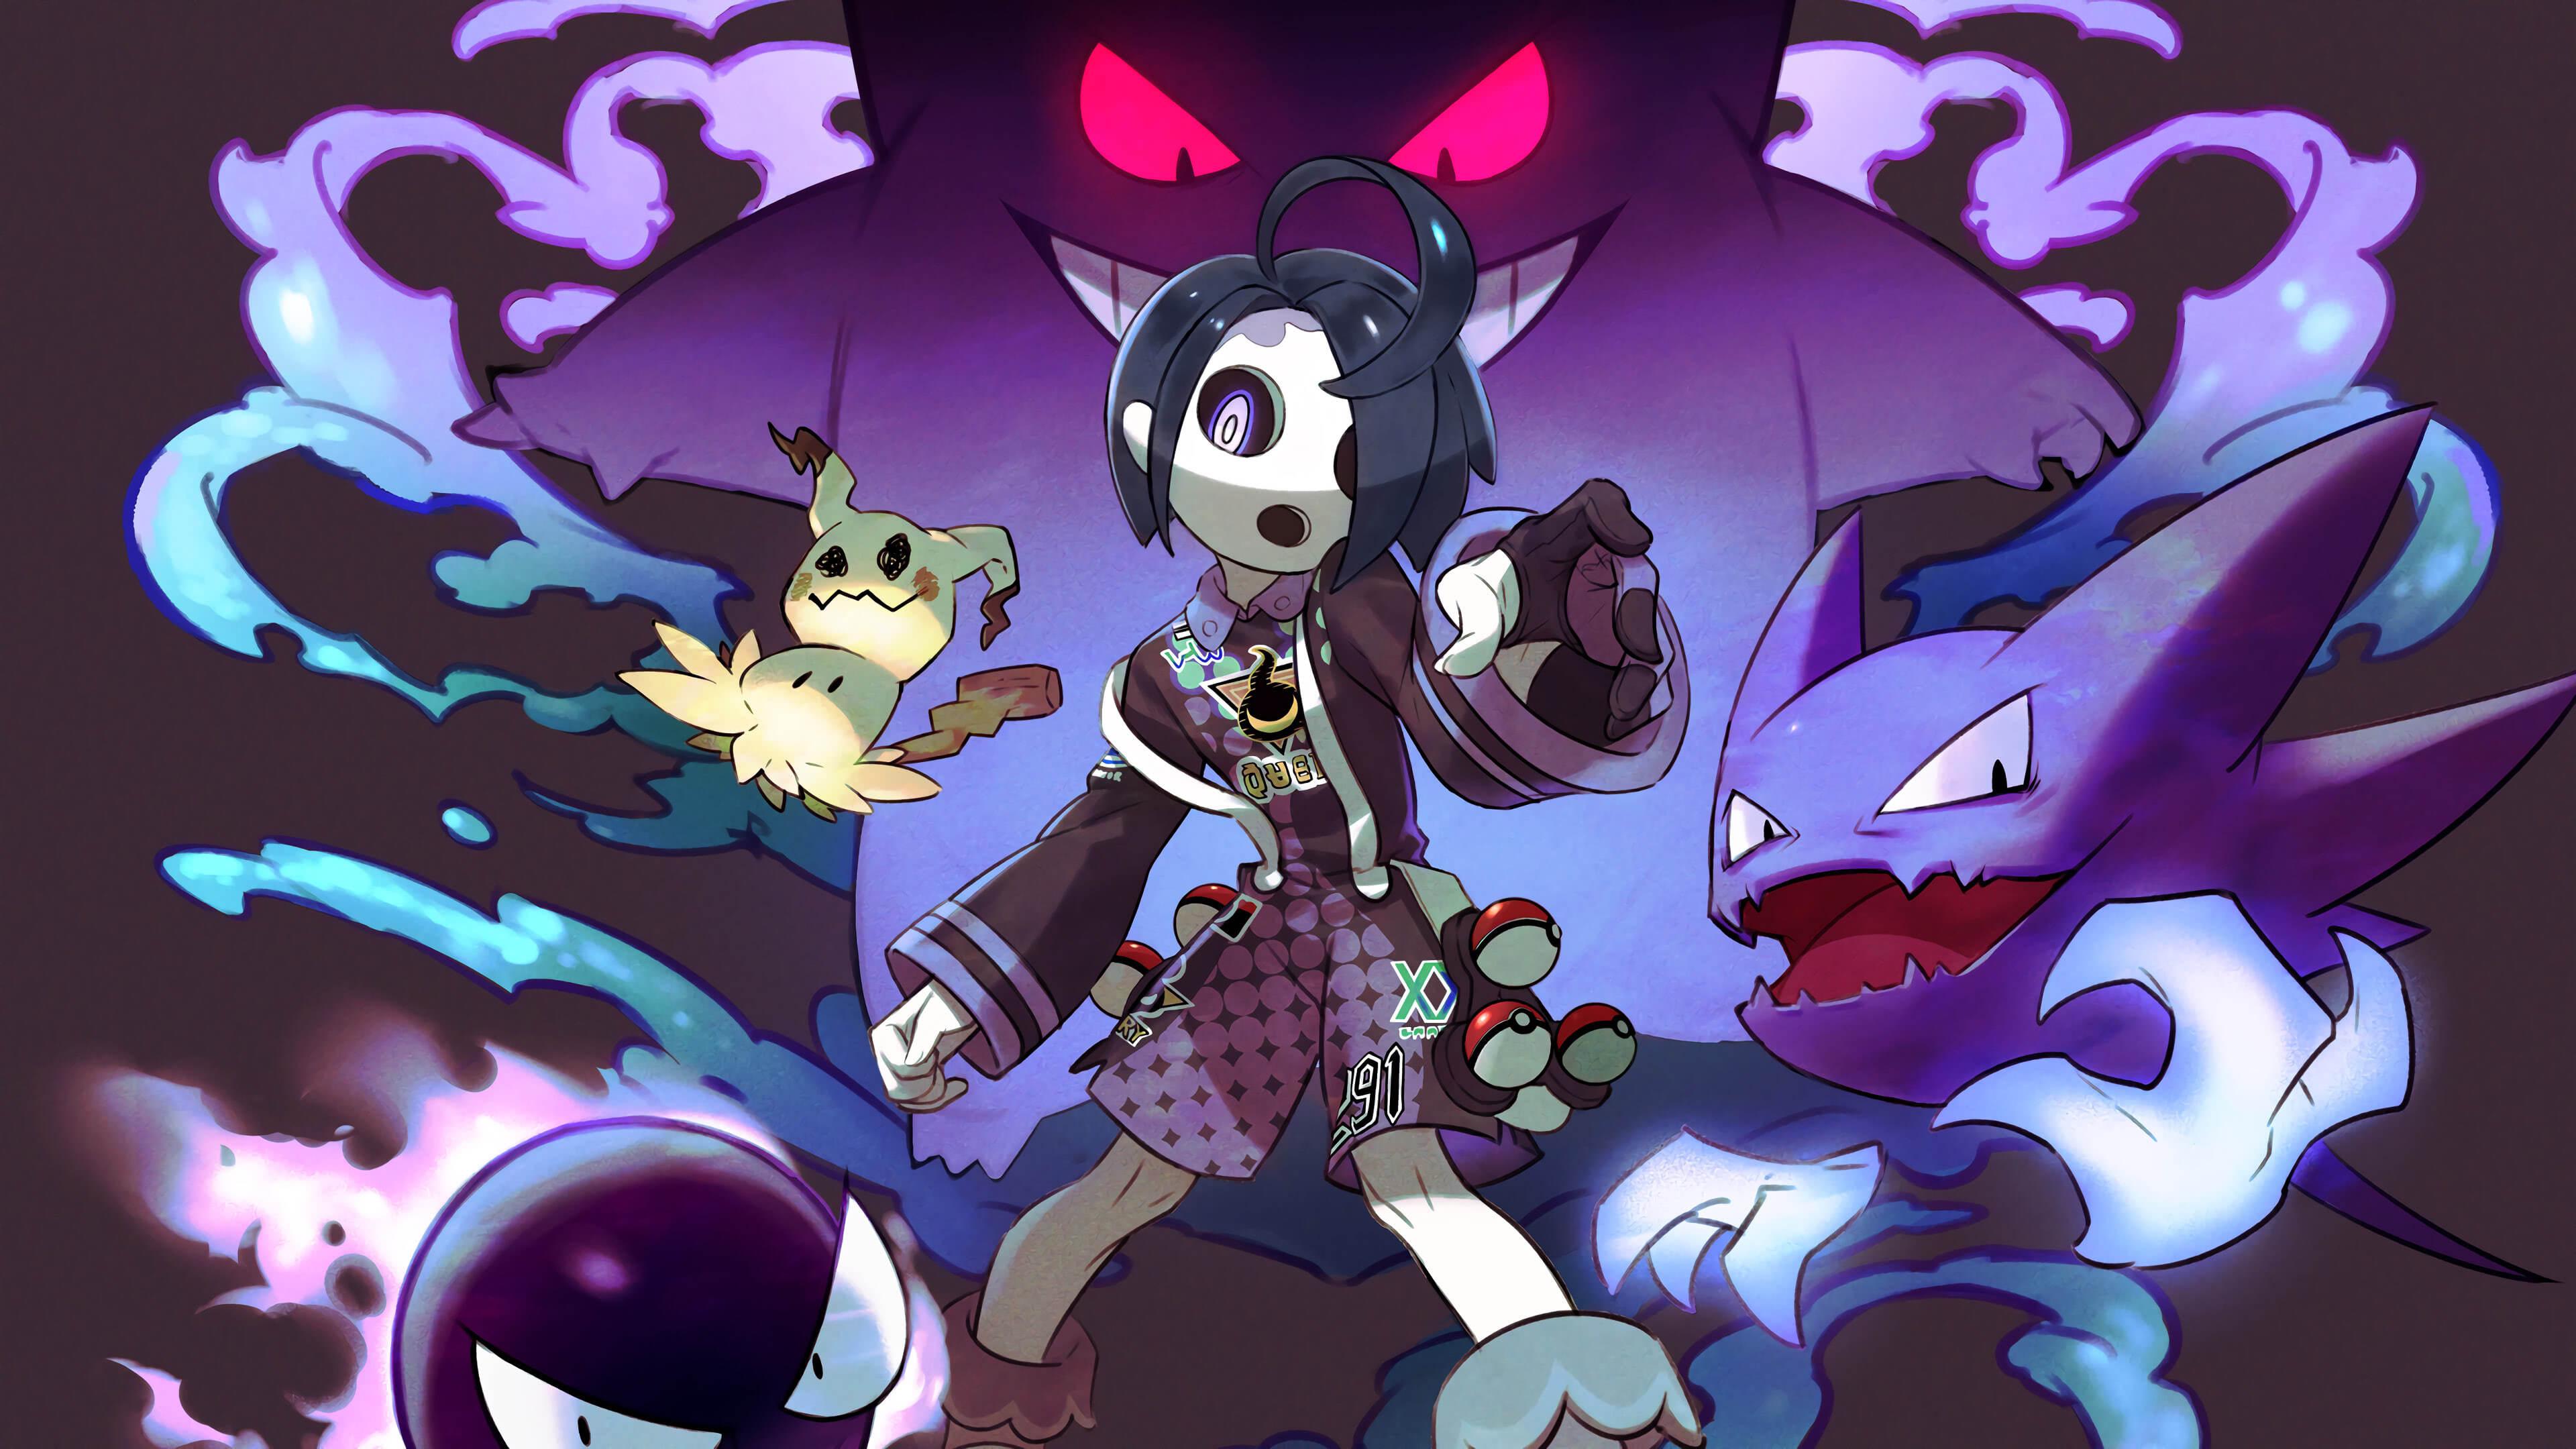 pokemon sword and shield allister gengar mimikyu gastly haunter uhd 4k wallpaper